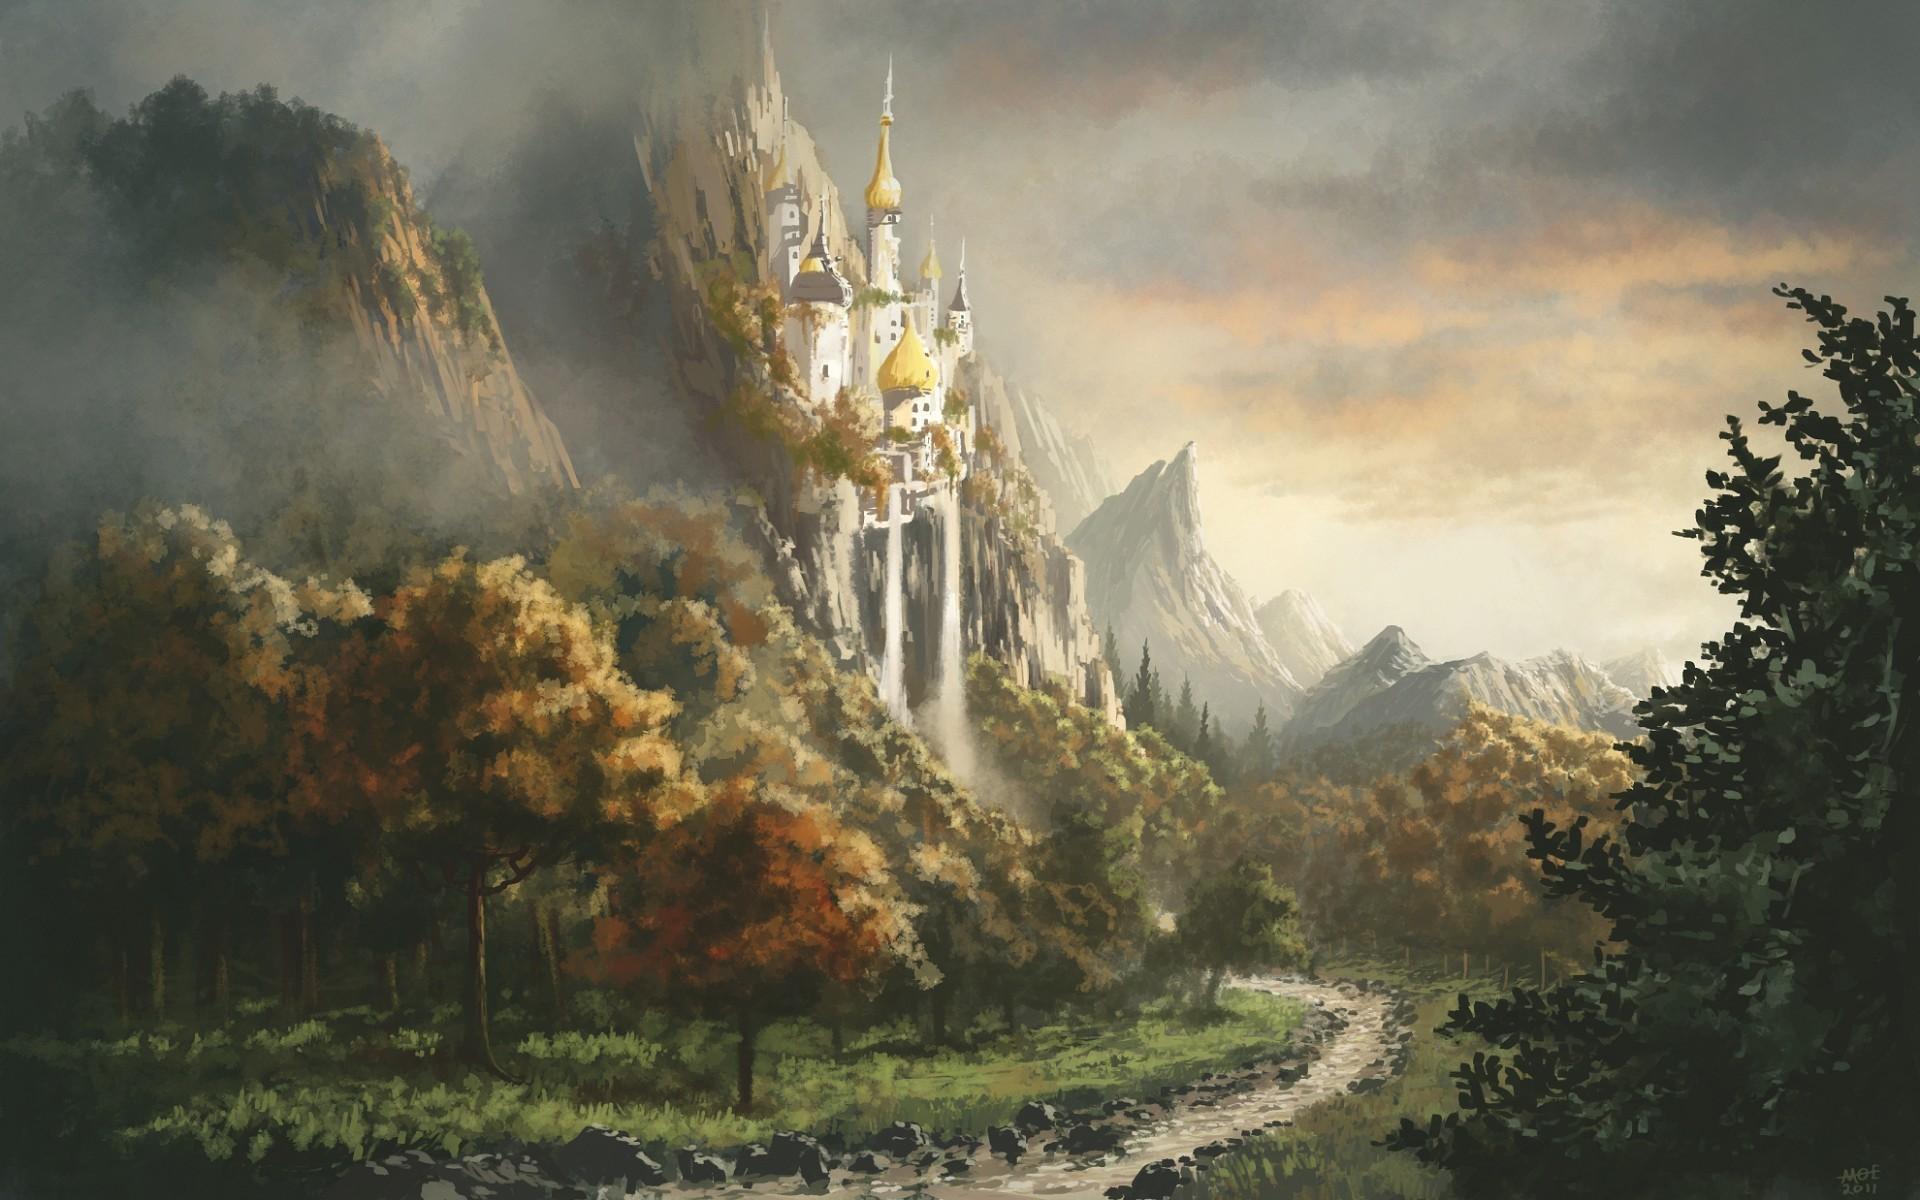 Res: 1920x1200, Pony Pony Freundschaft ist Magie Schlösser Landschaften wallpaper